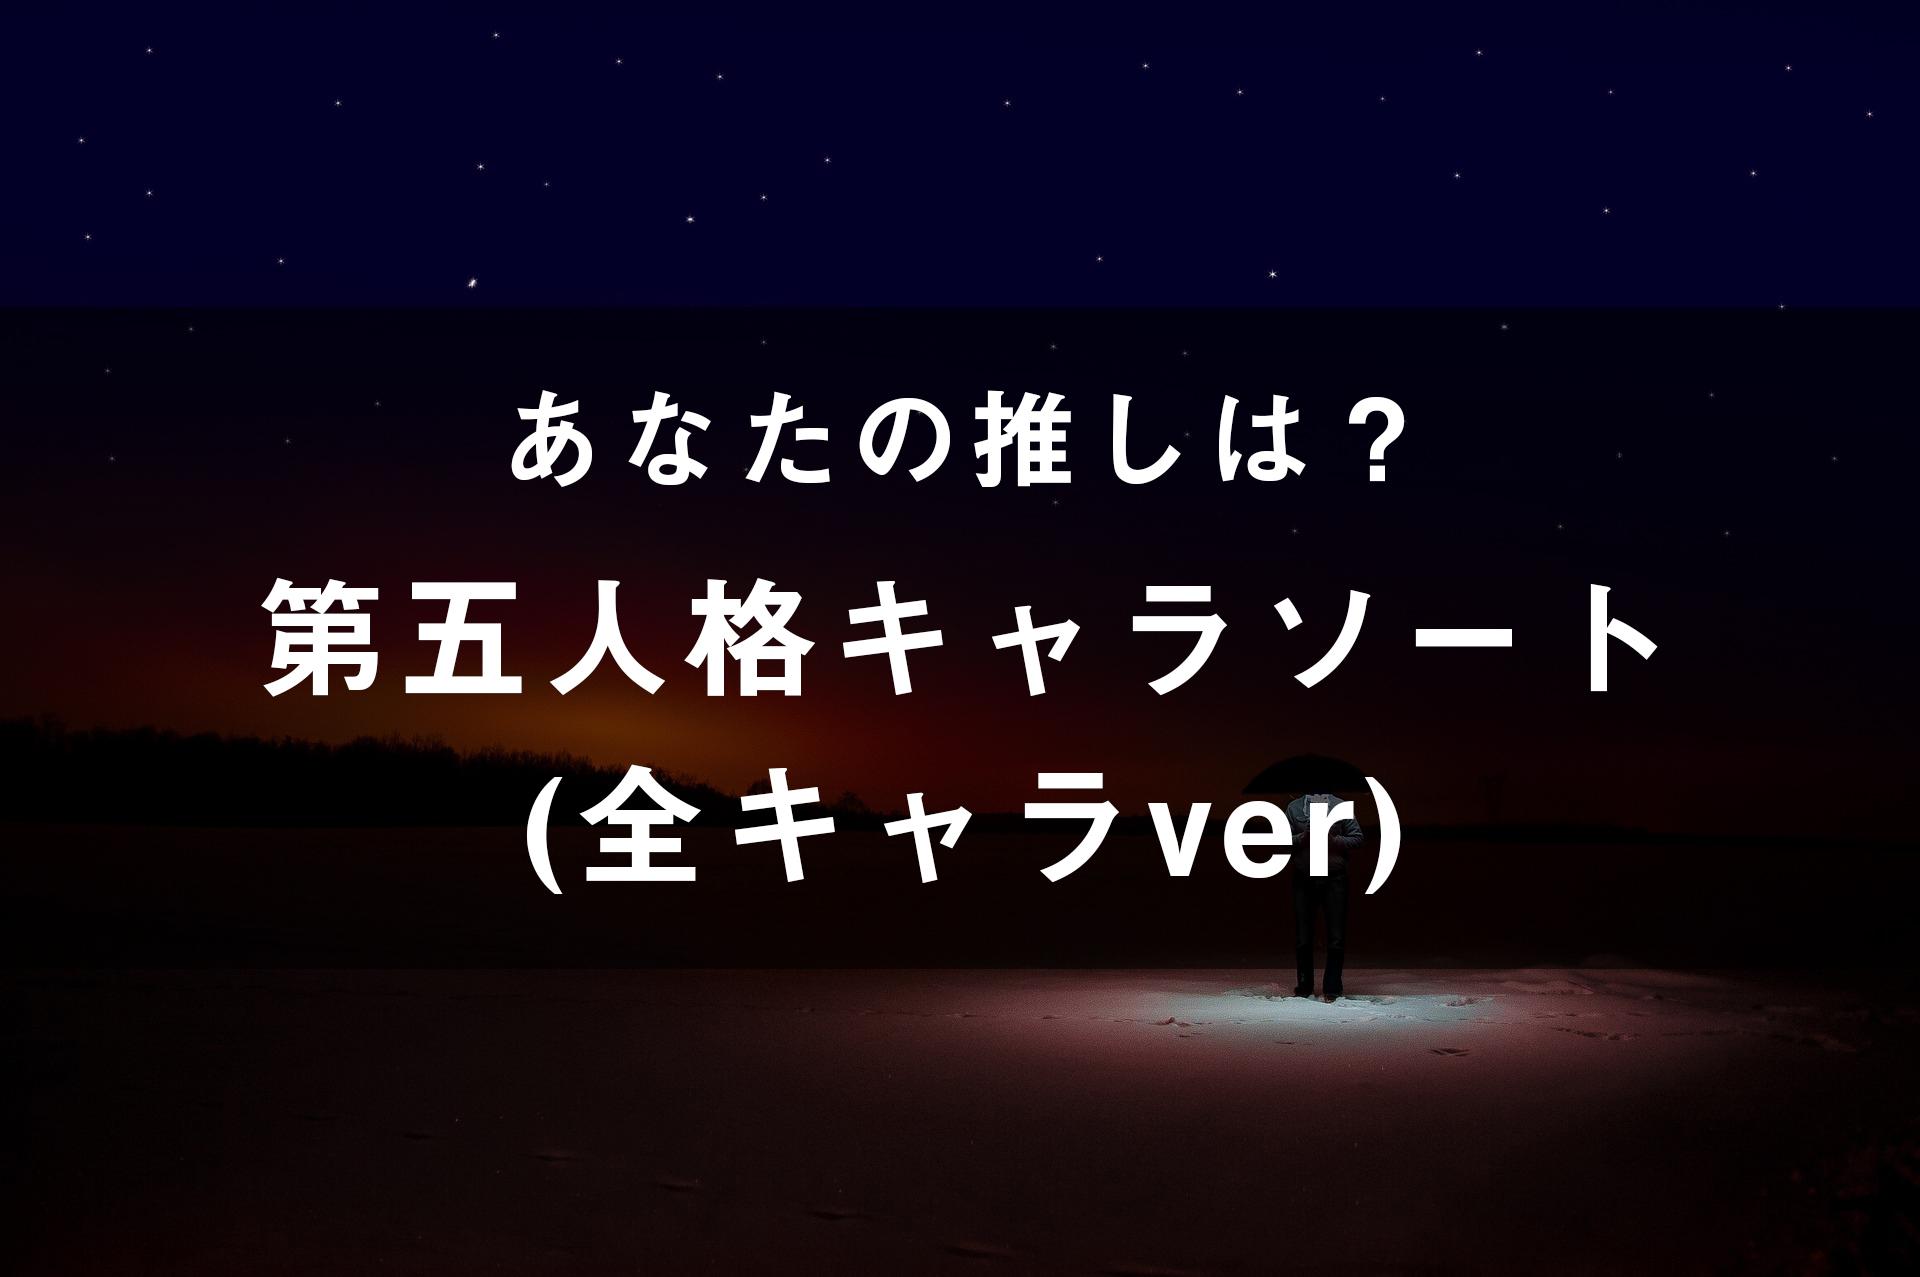 「IdentityV (第五人格)~全キャラver.」のキャラソート(画像付き)